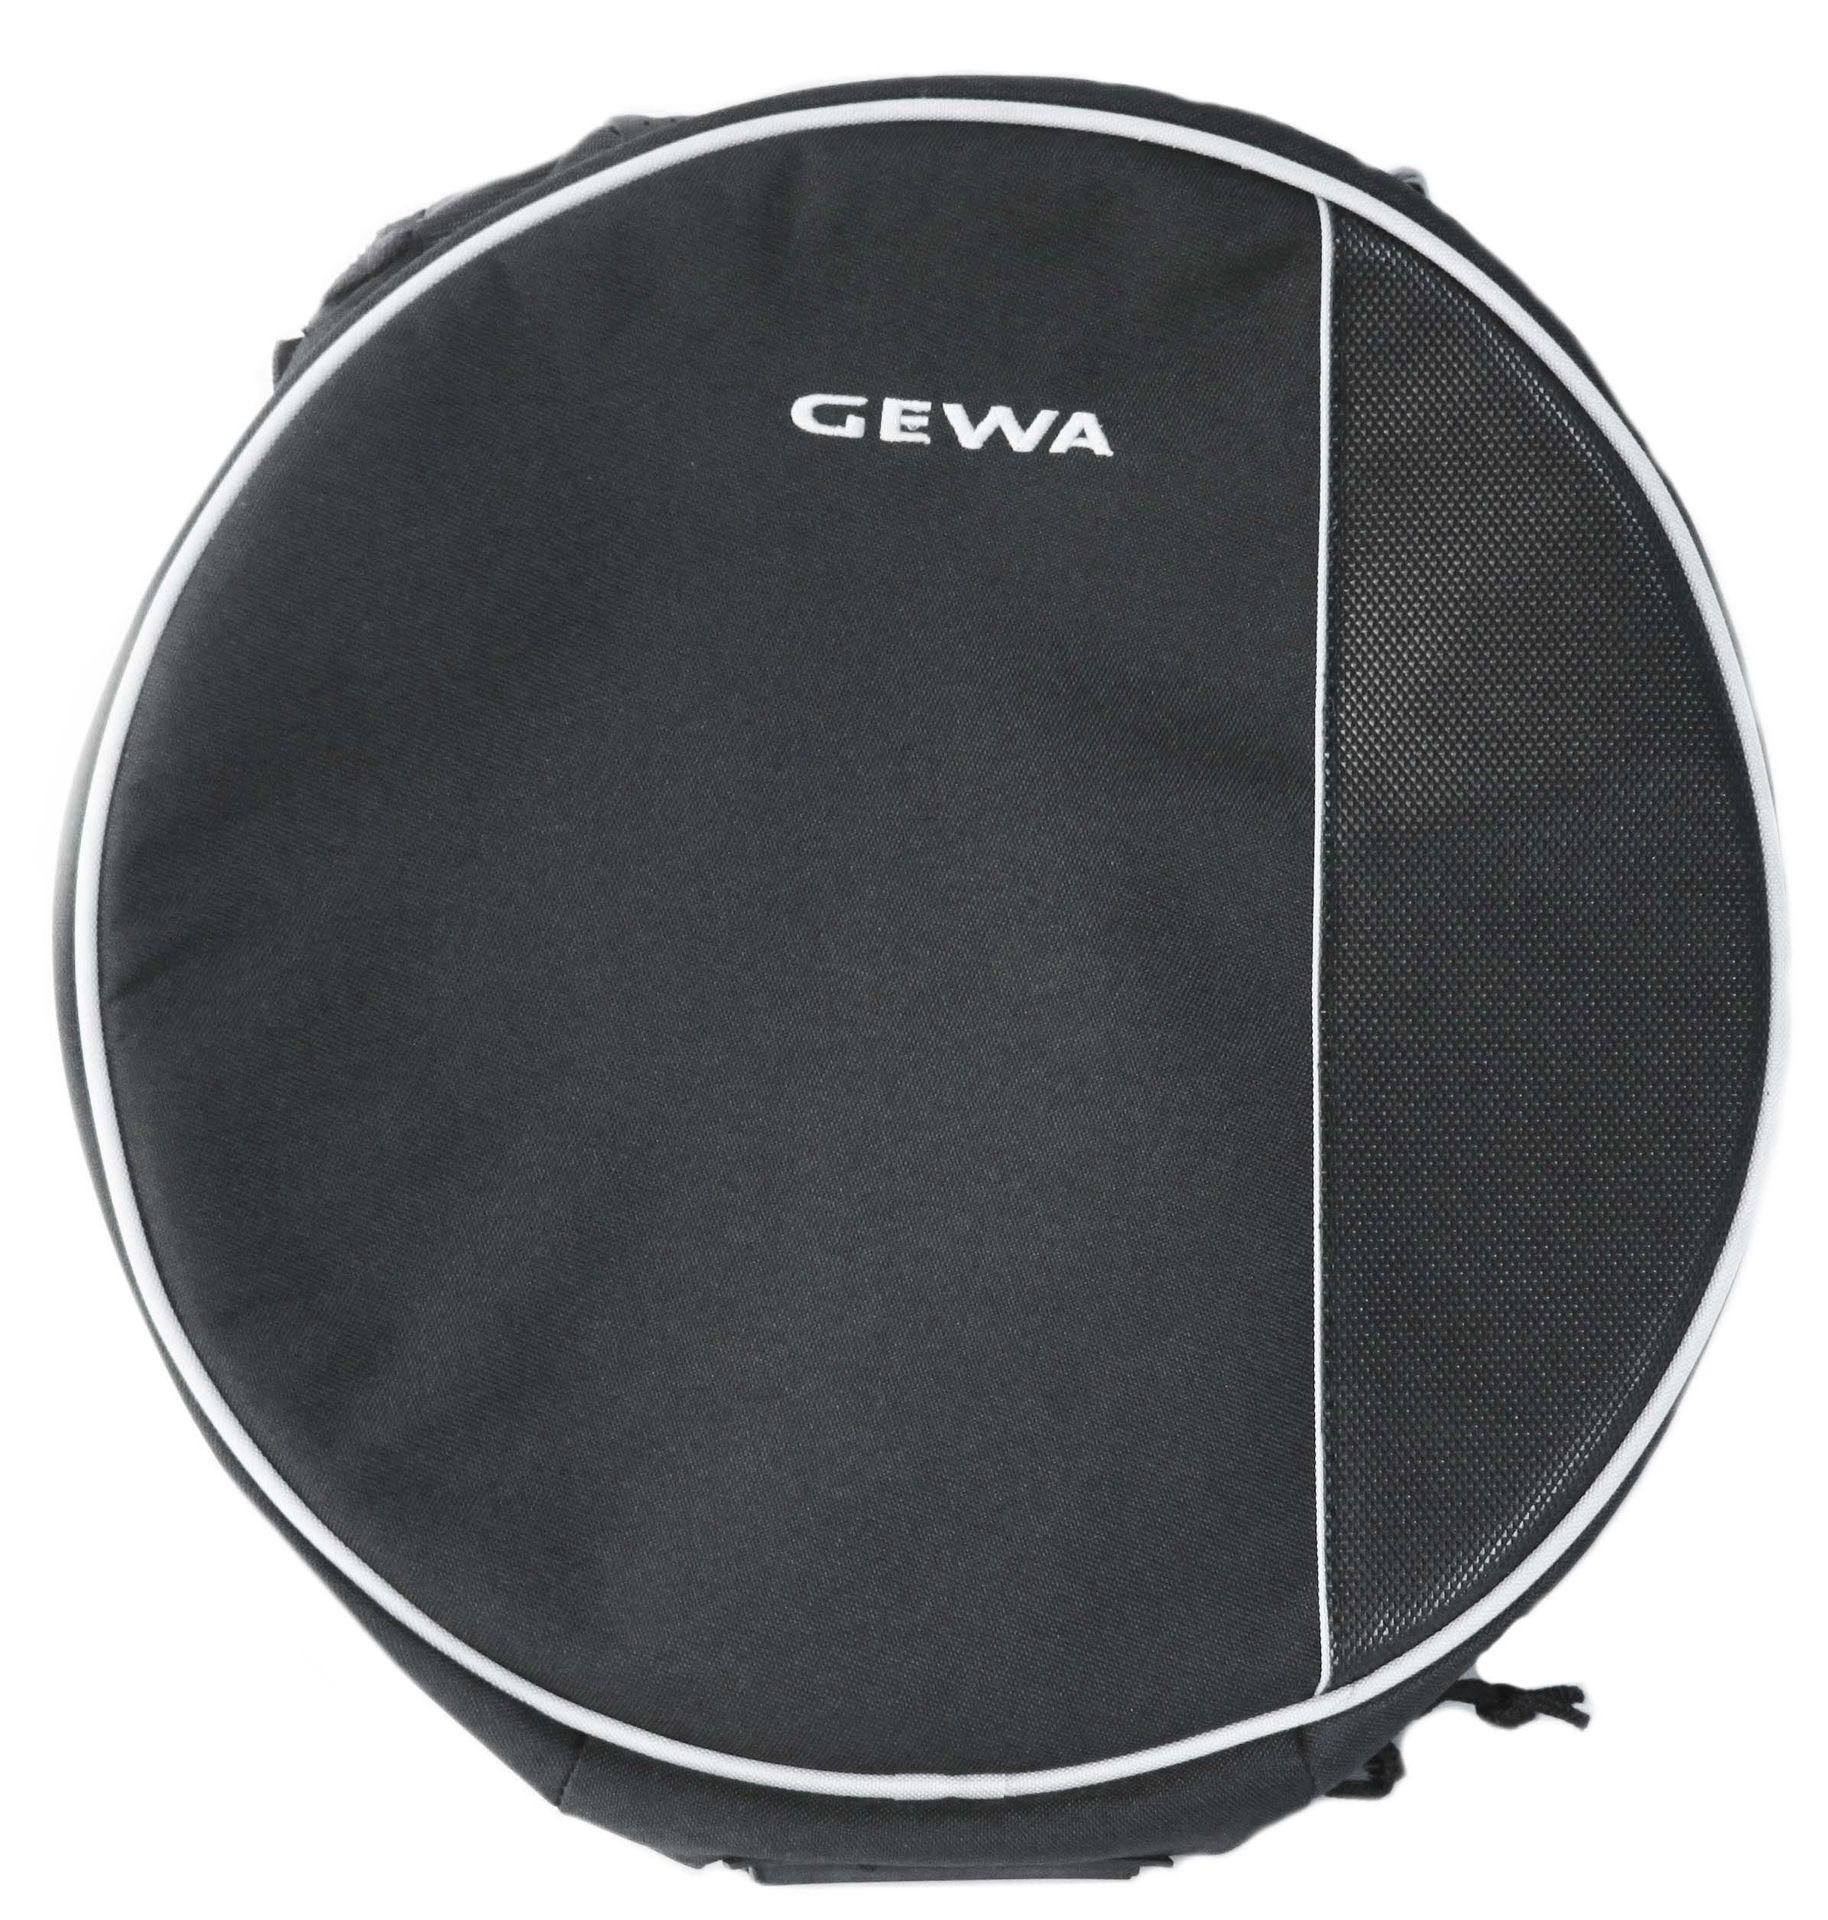 "GEWA Premium Tom Bag 10"" x 9"" (Restposten alte Serie)"